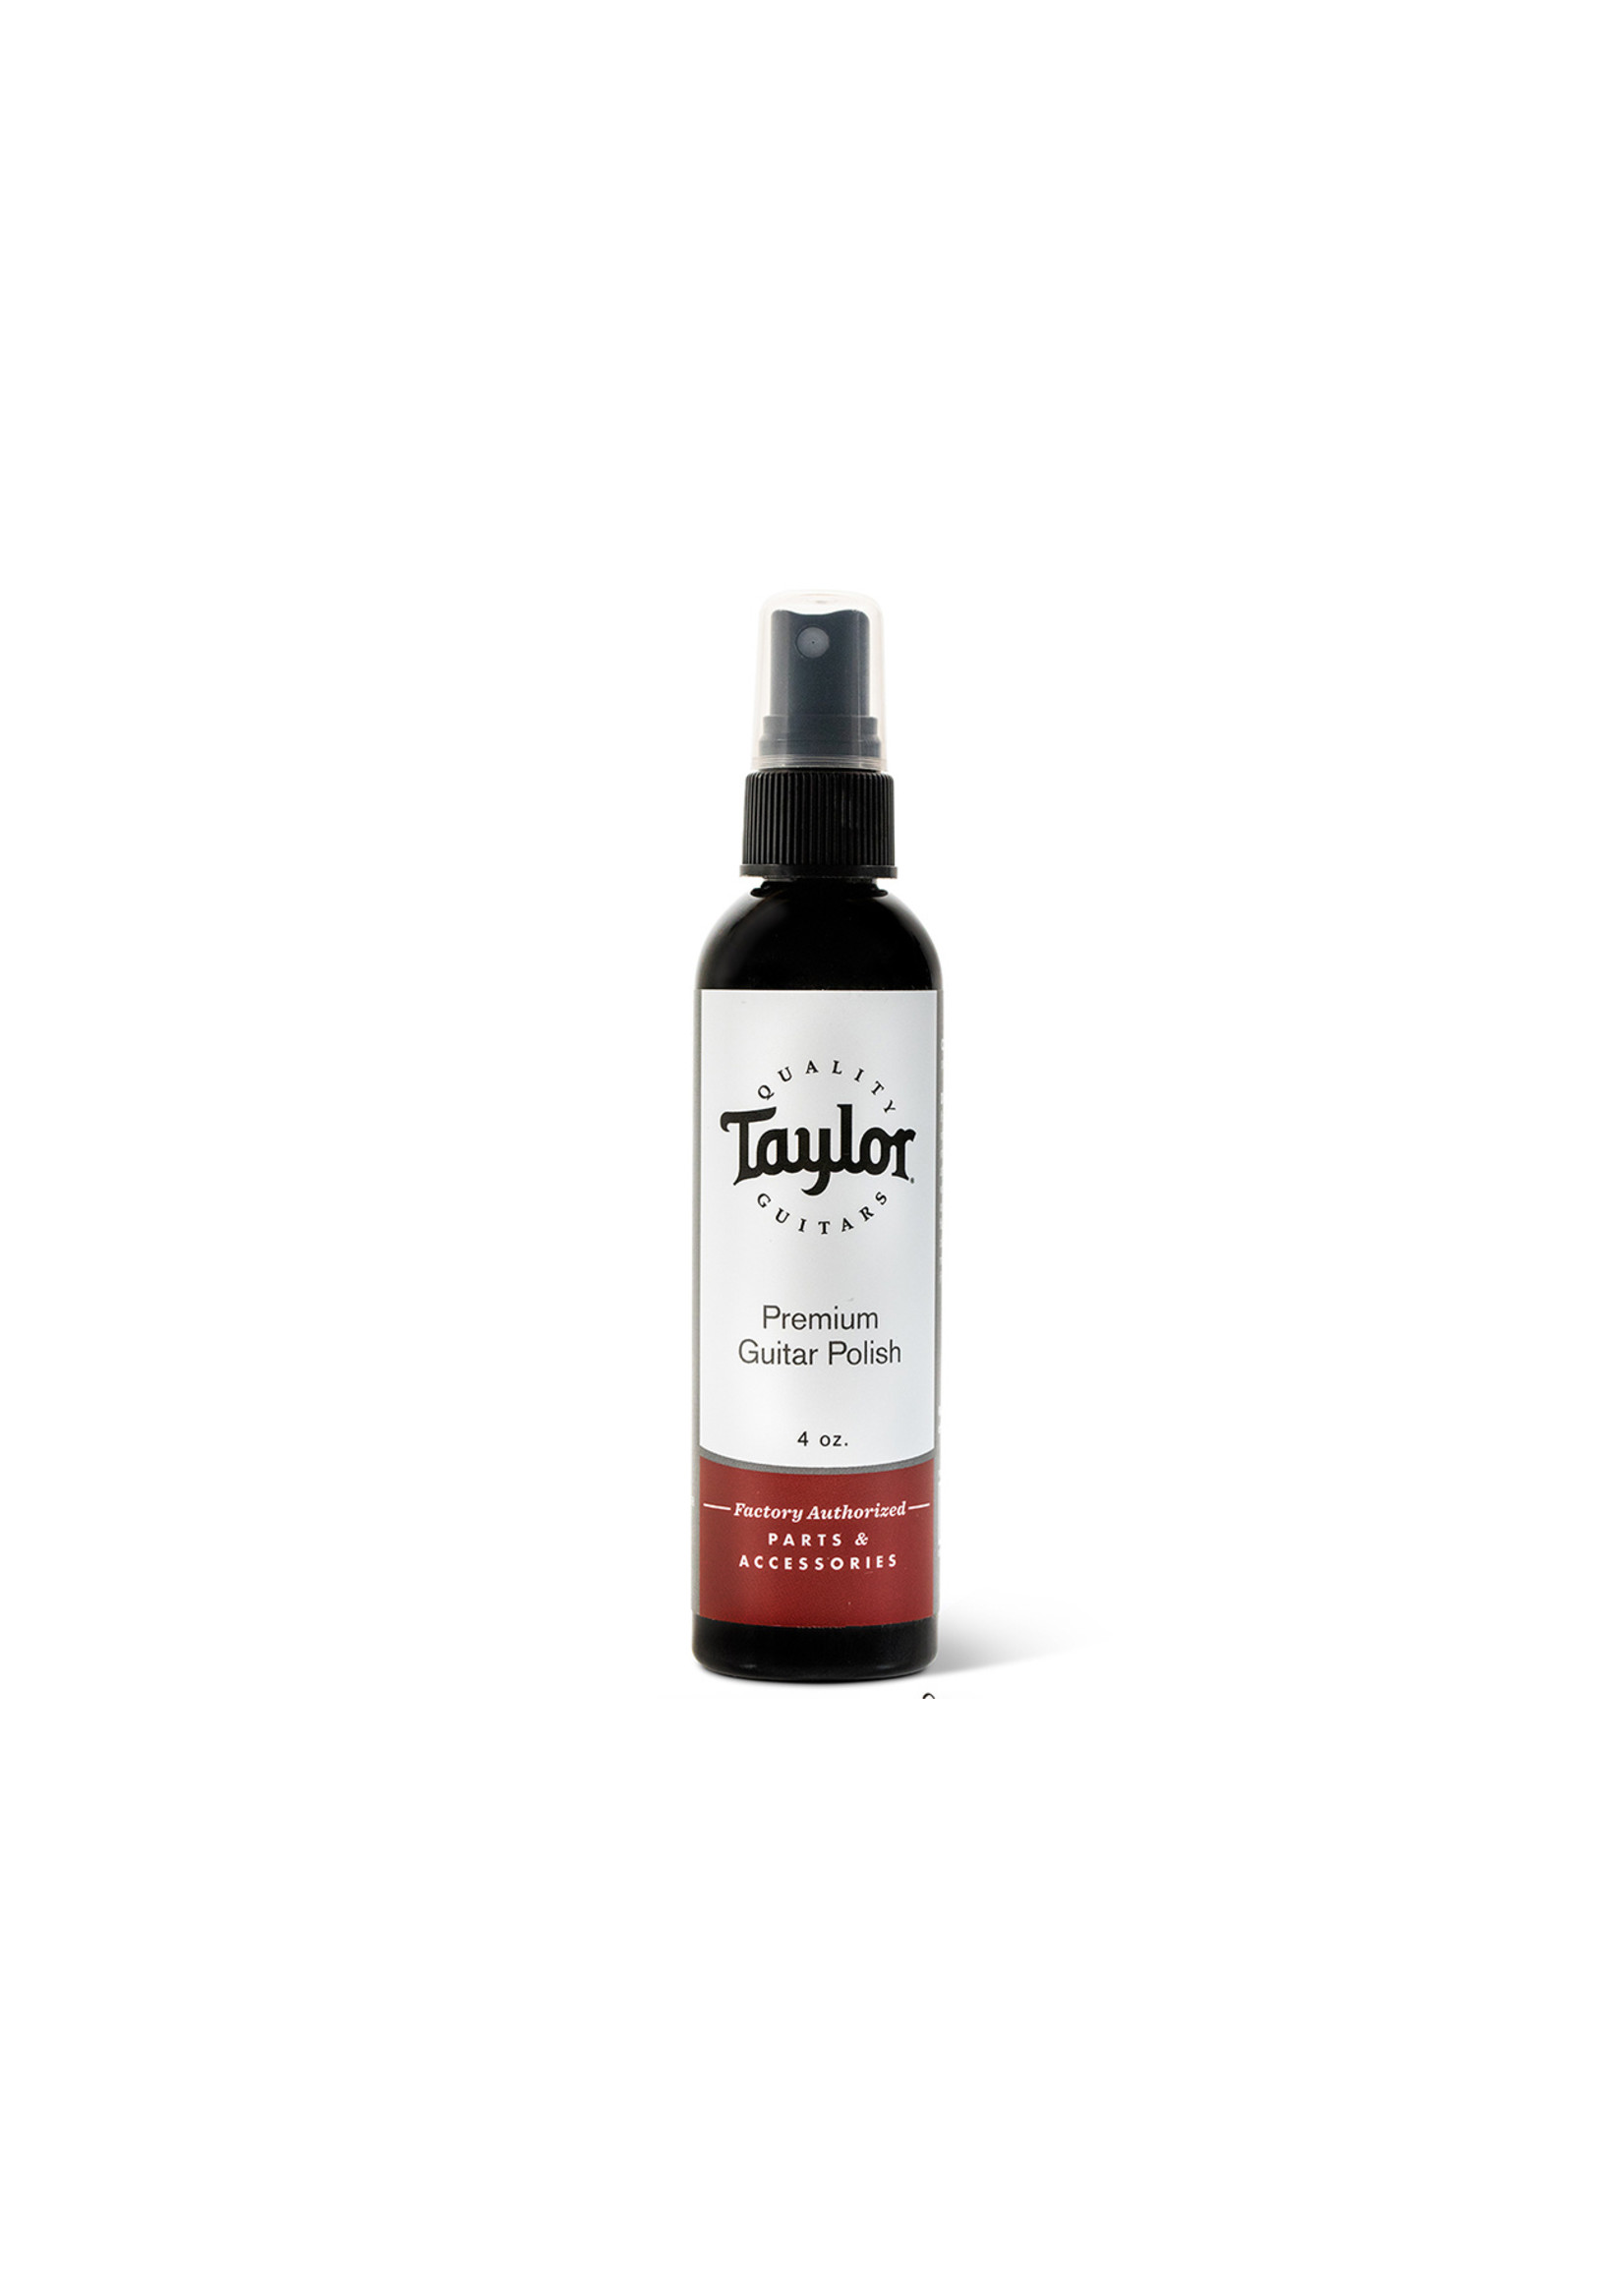 Taylor Taylor Premium Guitar Polish 4Oz.